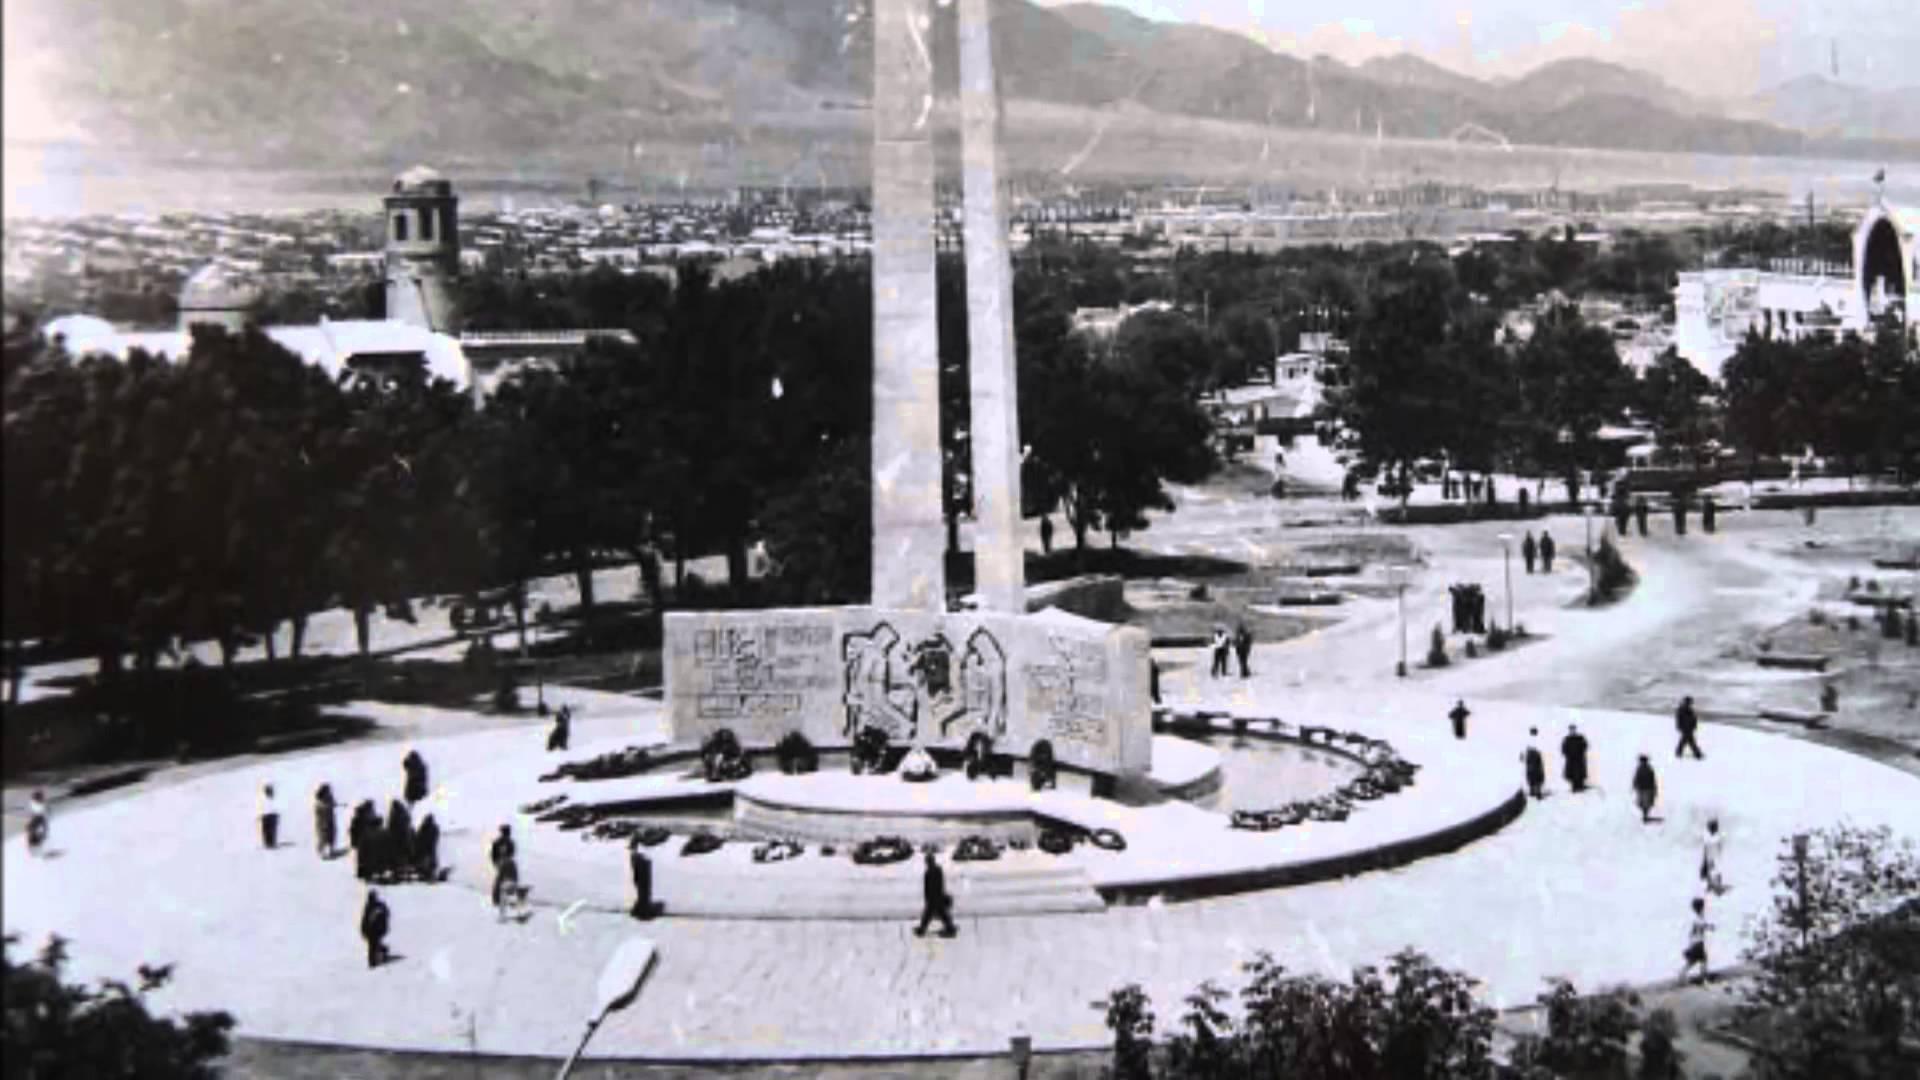 Прикол секс таджикский худжанд 19 фотография